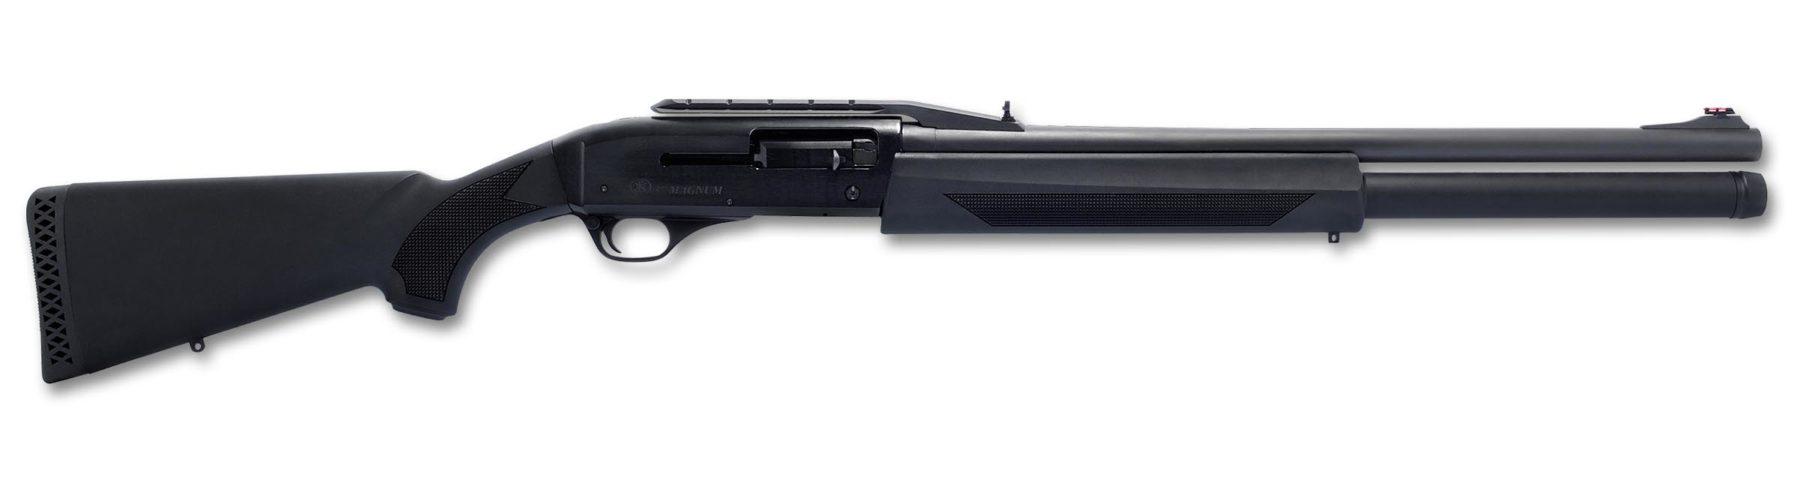 FN SL Police Shotgun Image